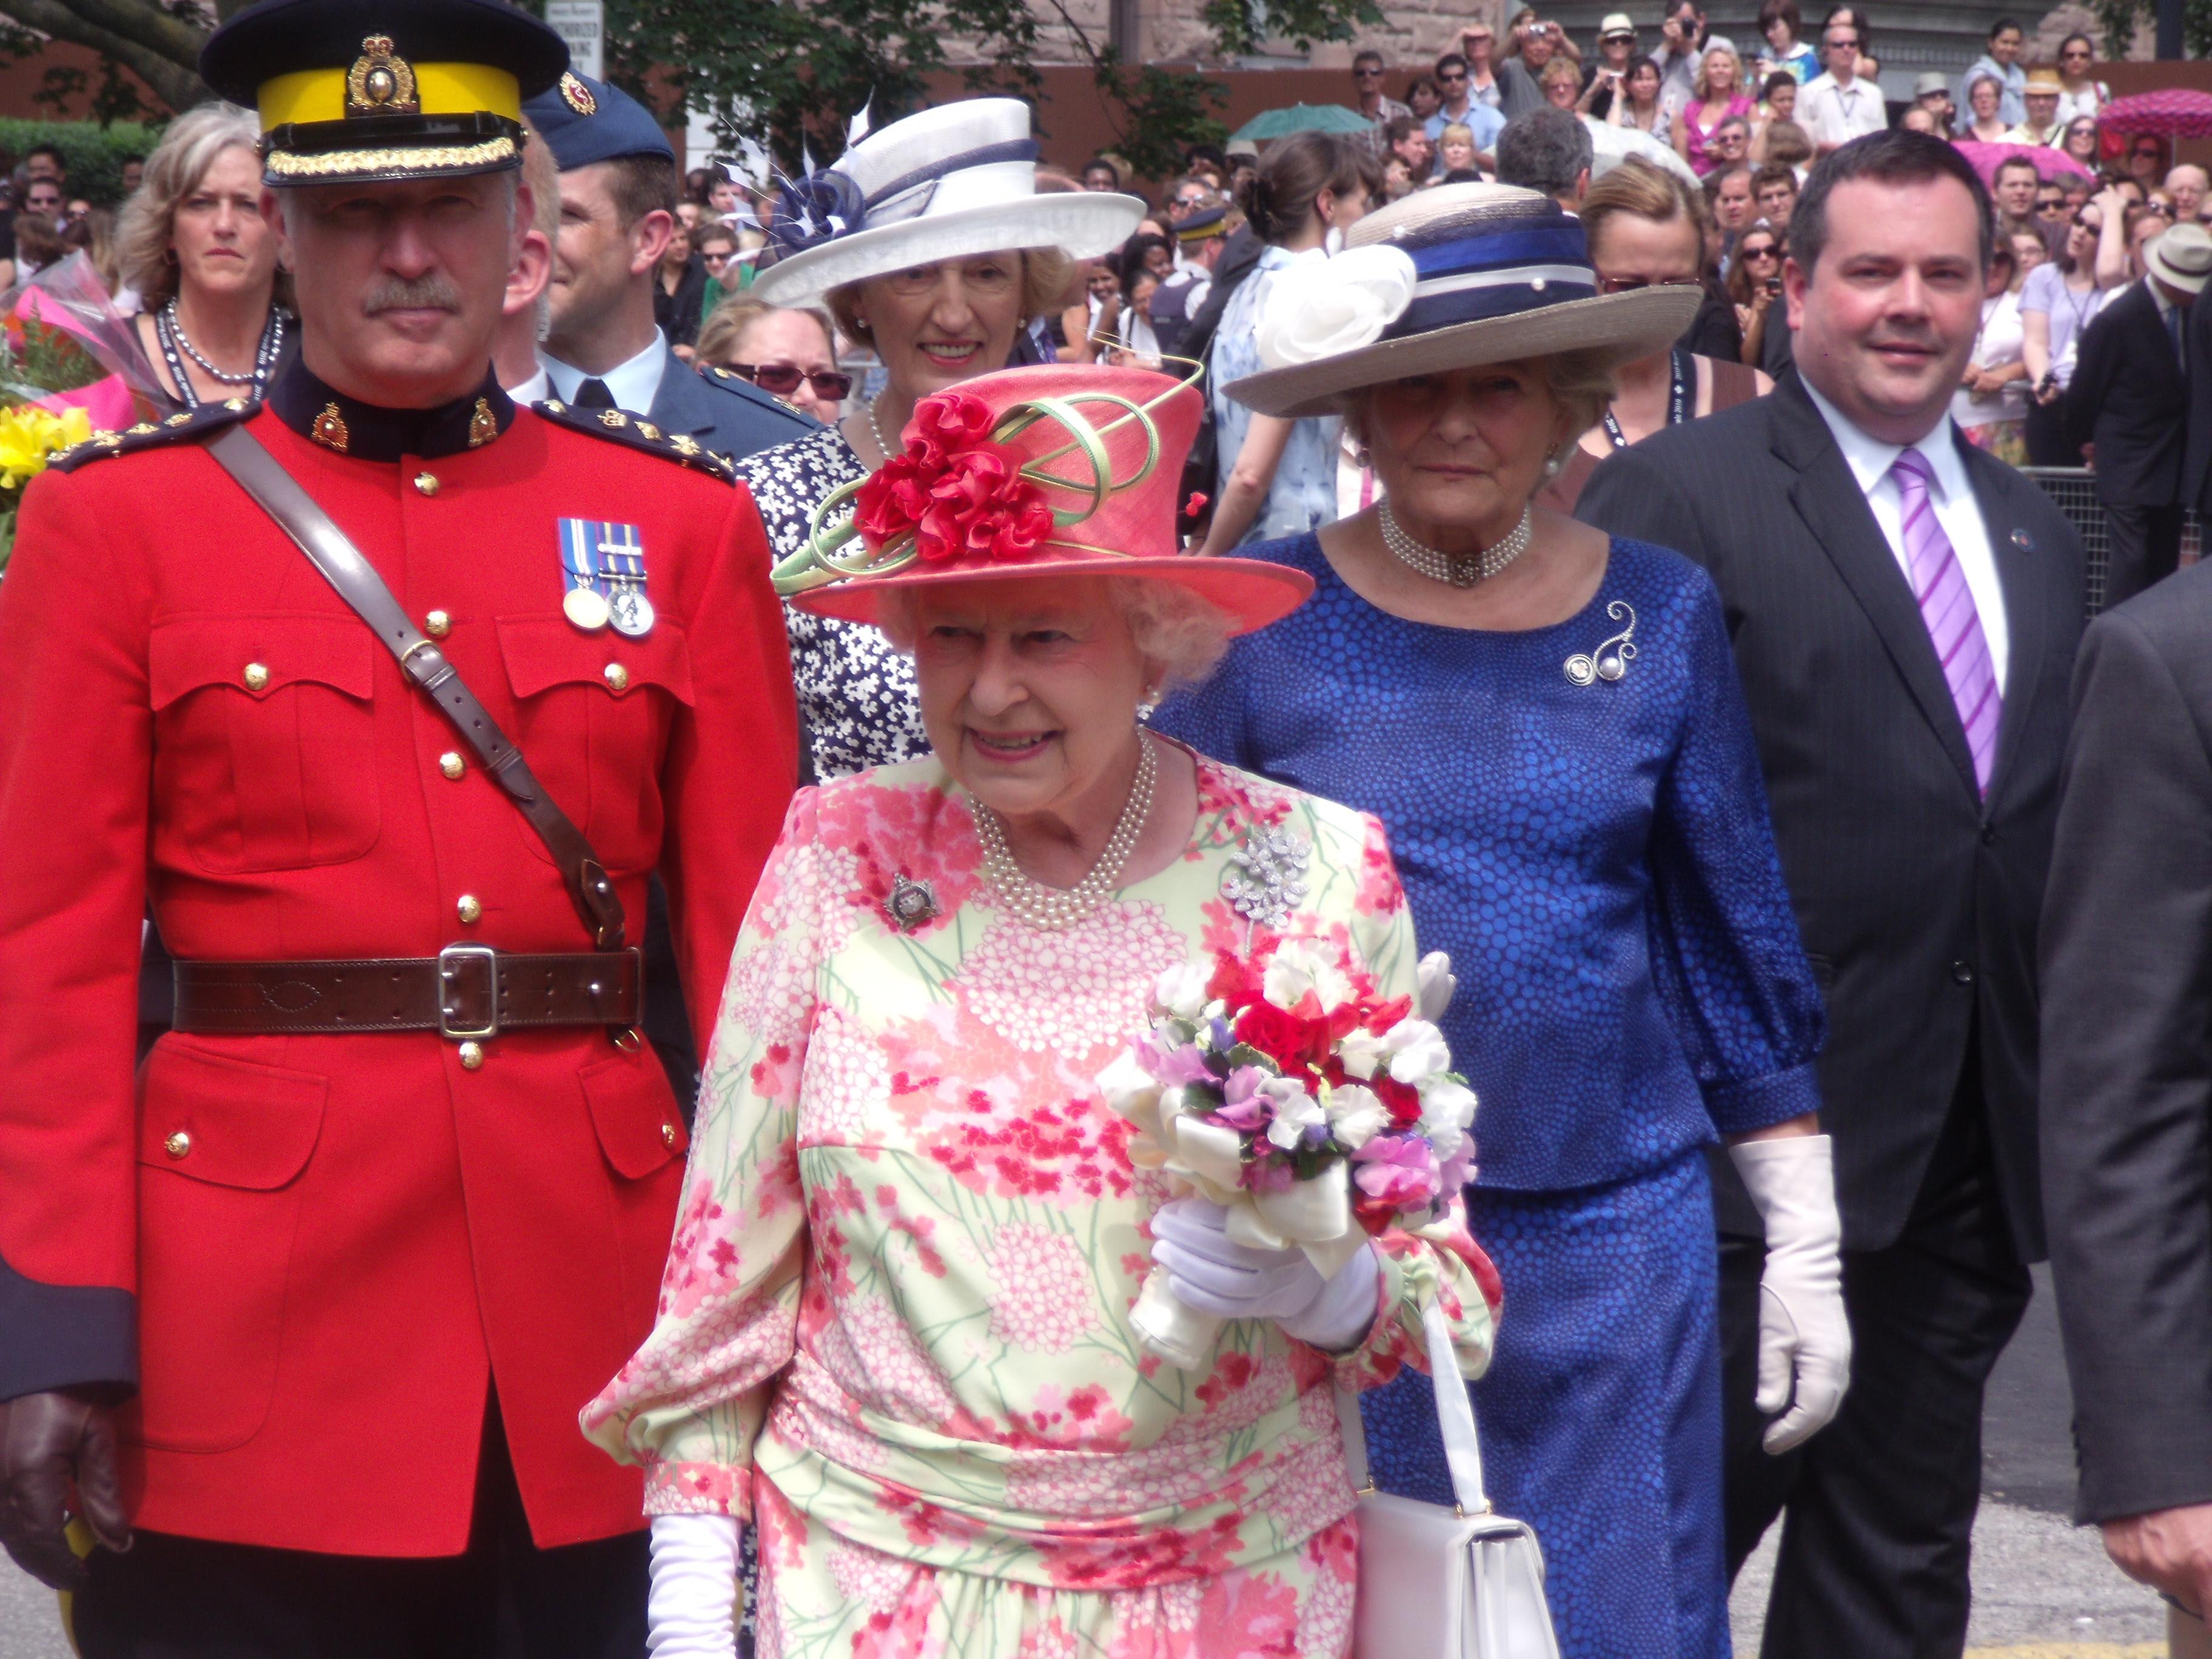 Her Britannic Majesty in Toronto in 2010